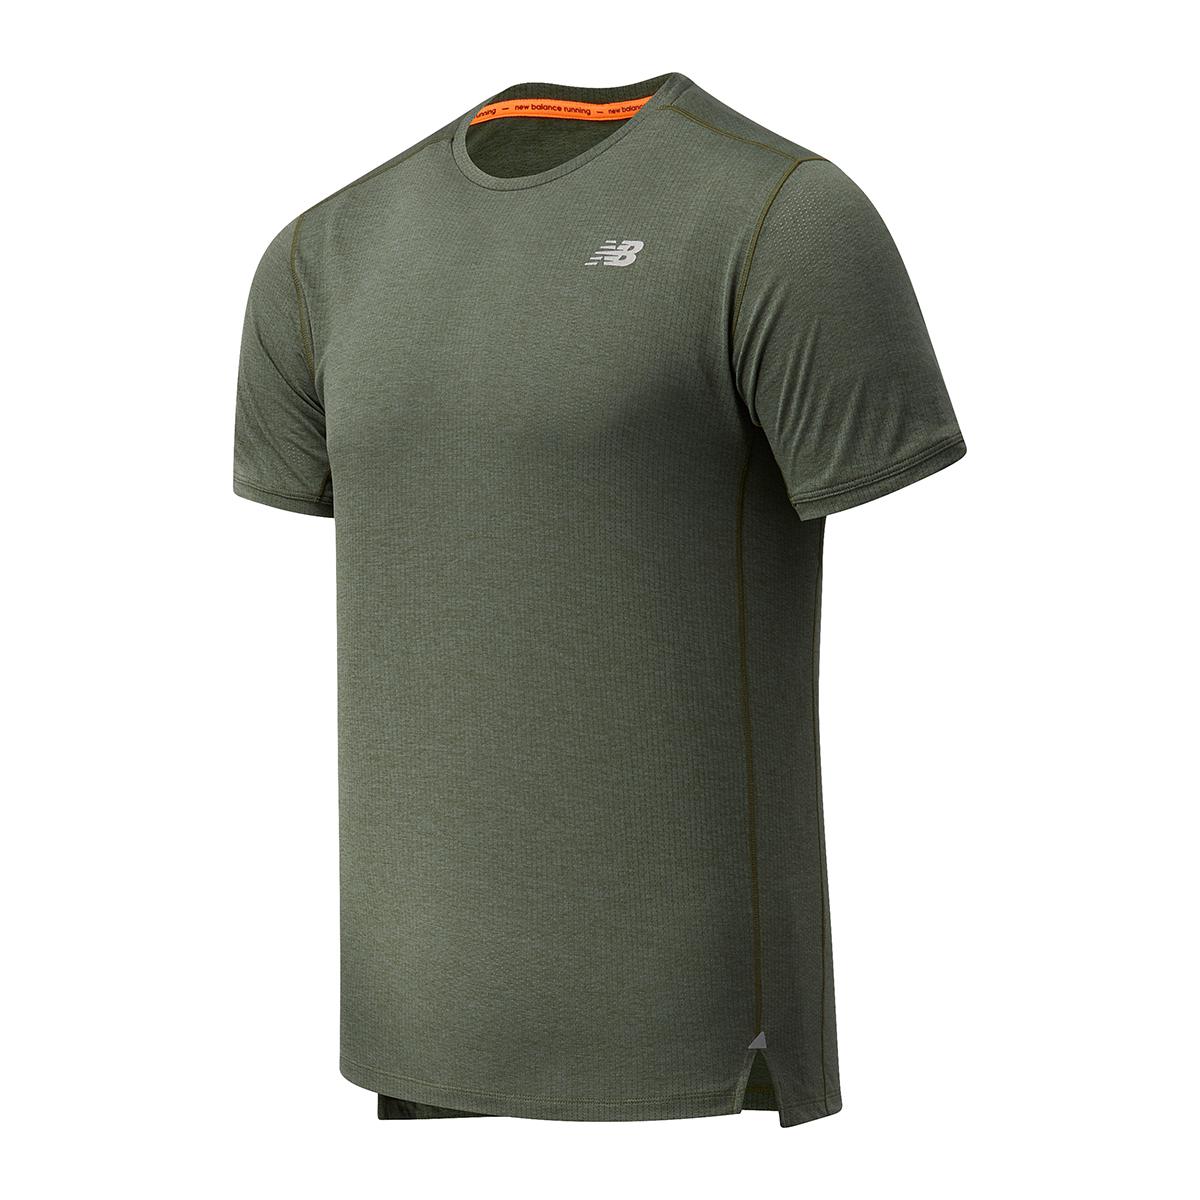 Men's New Balance Impact Run Short Sleeve, , large, image 1